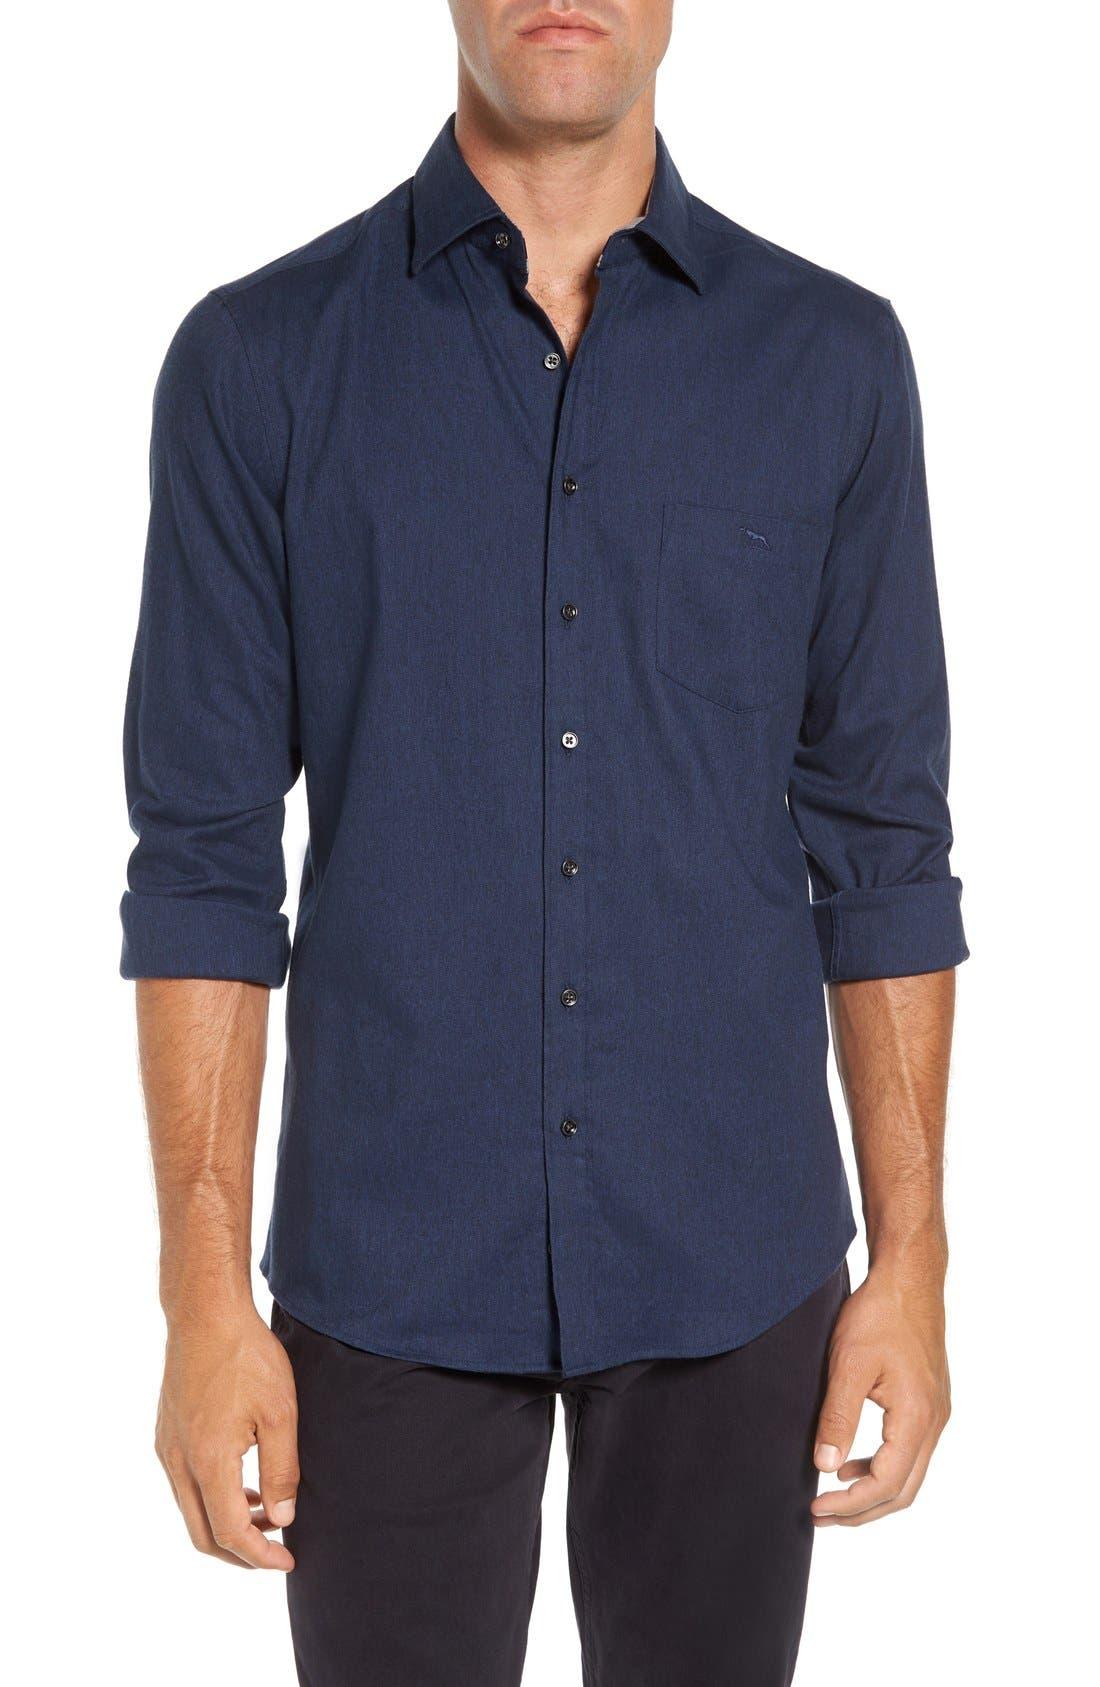 Alternate Image 1 Selected - Rodd & Gunn 'Sinclair' Trim Fit Brushed Twill Sport Shirt